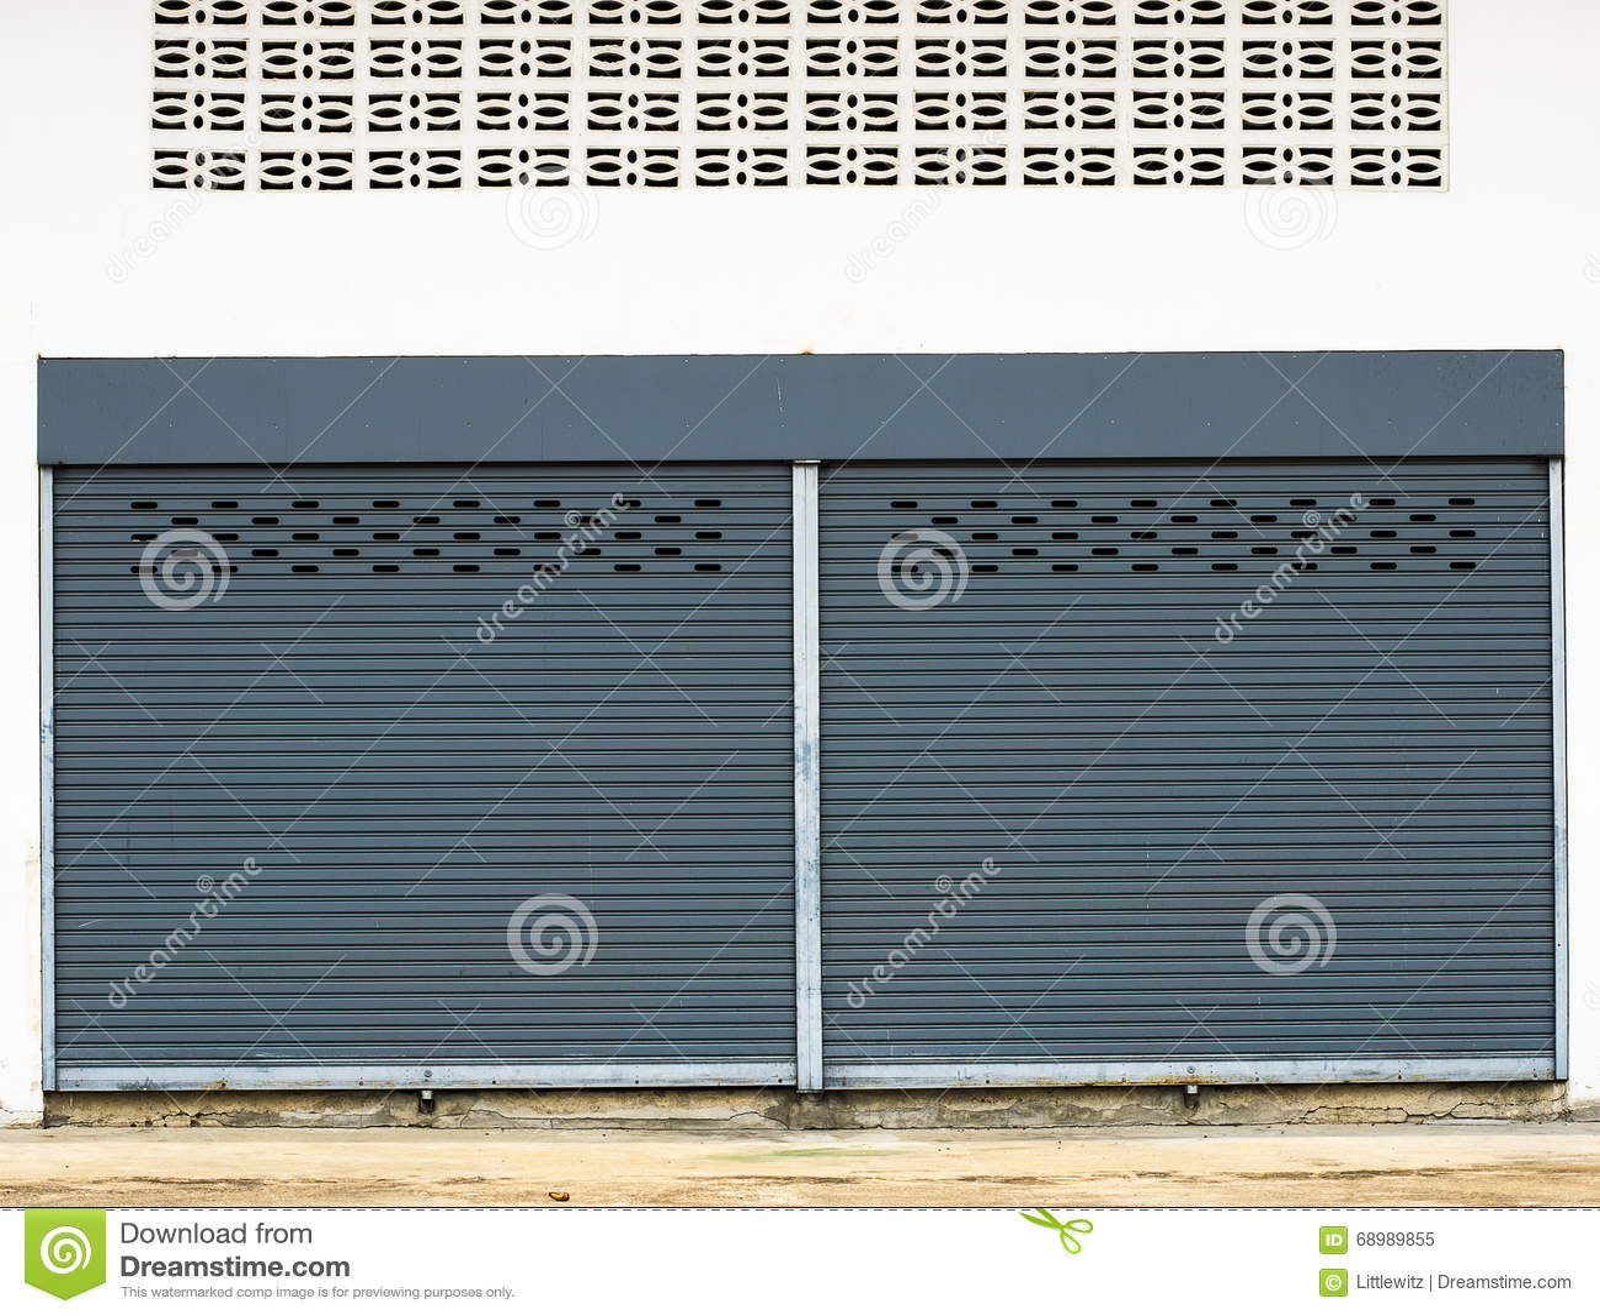 Plank Muur Blind.Staal Rollend Blind Stock Afbeelding Afbeelding Bestaande Uit